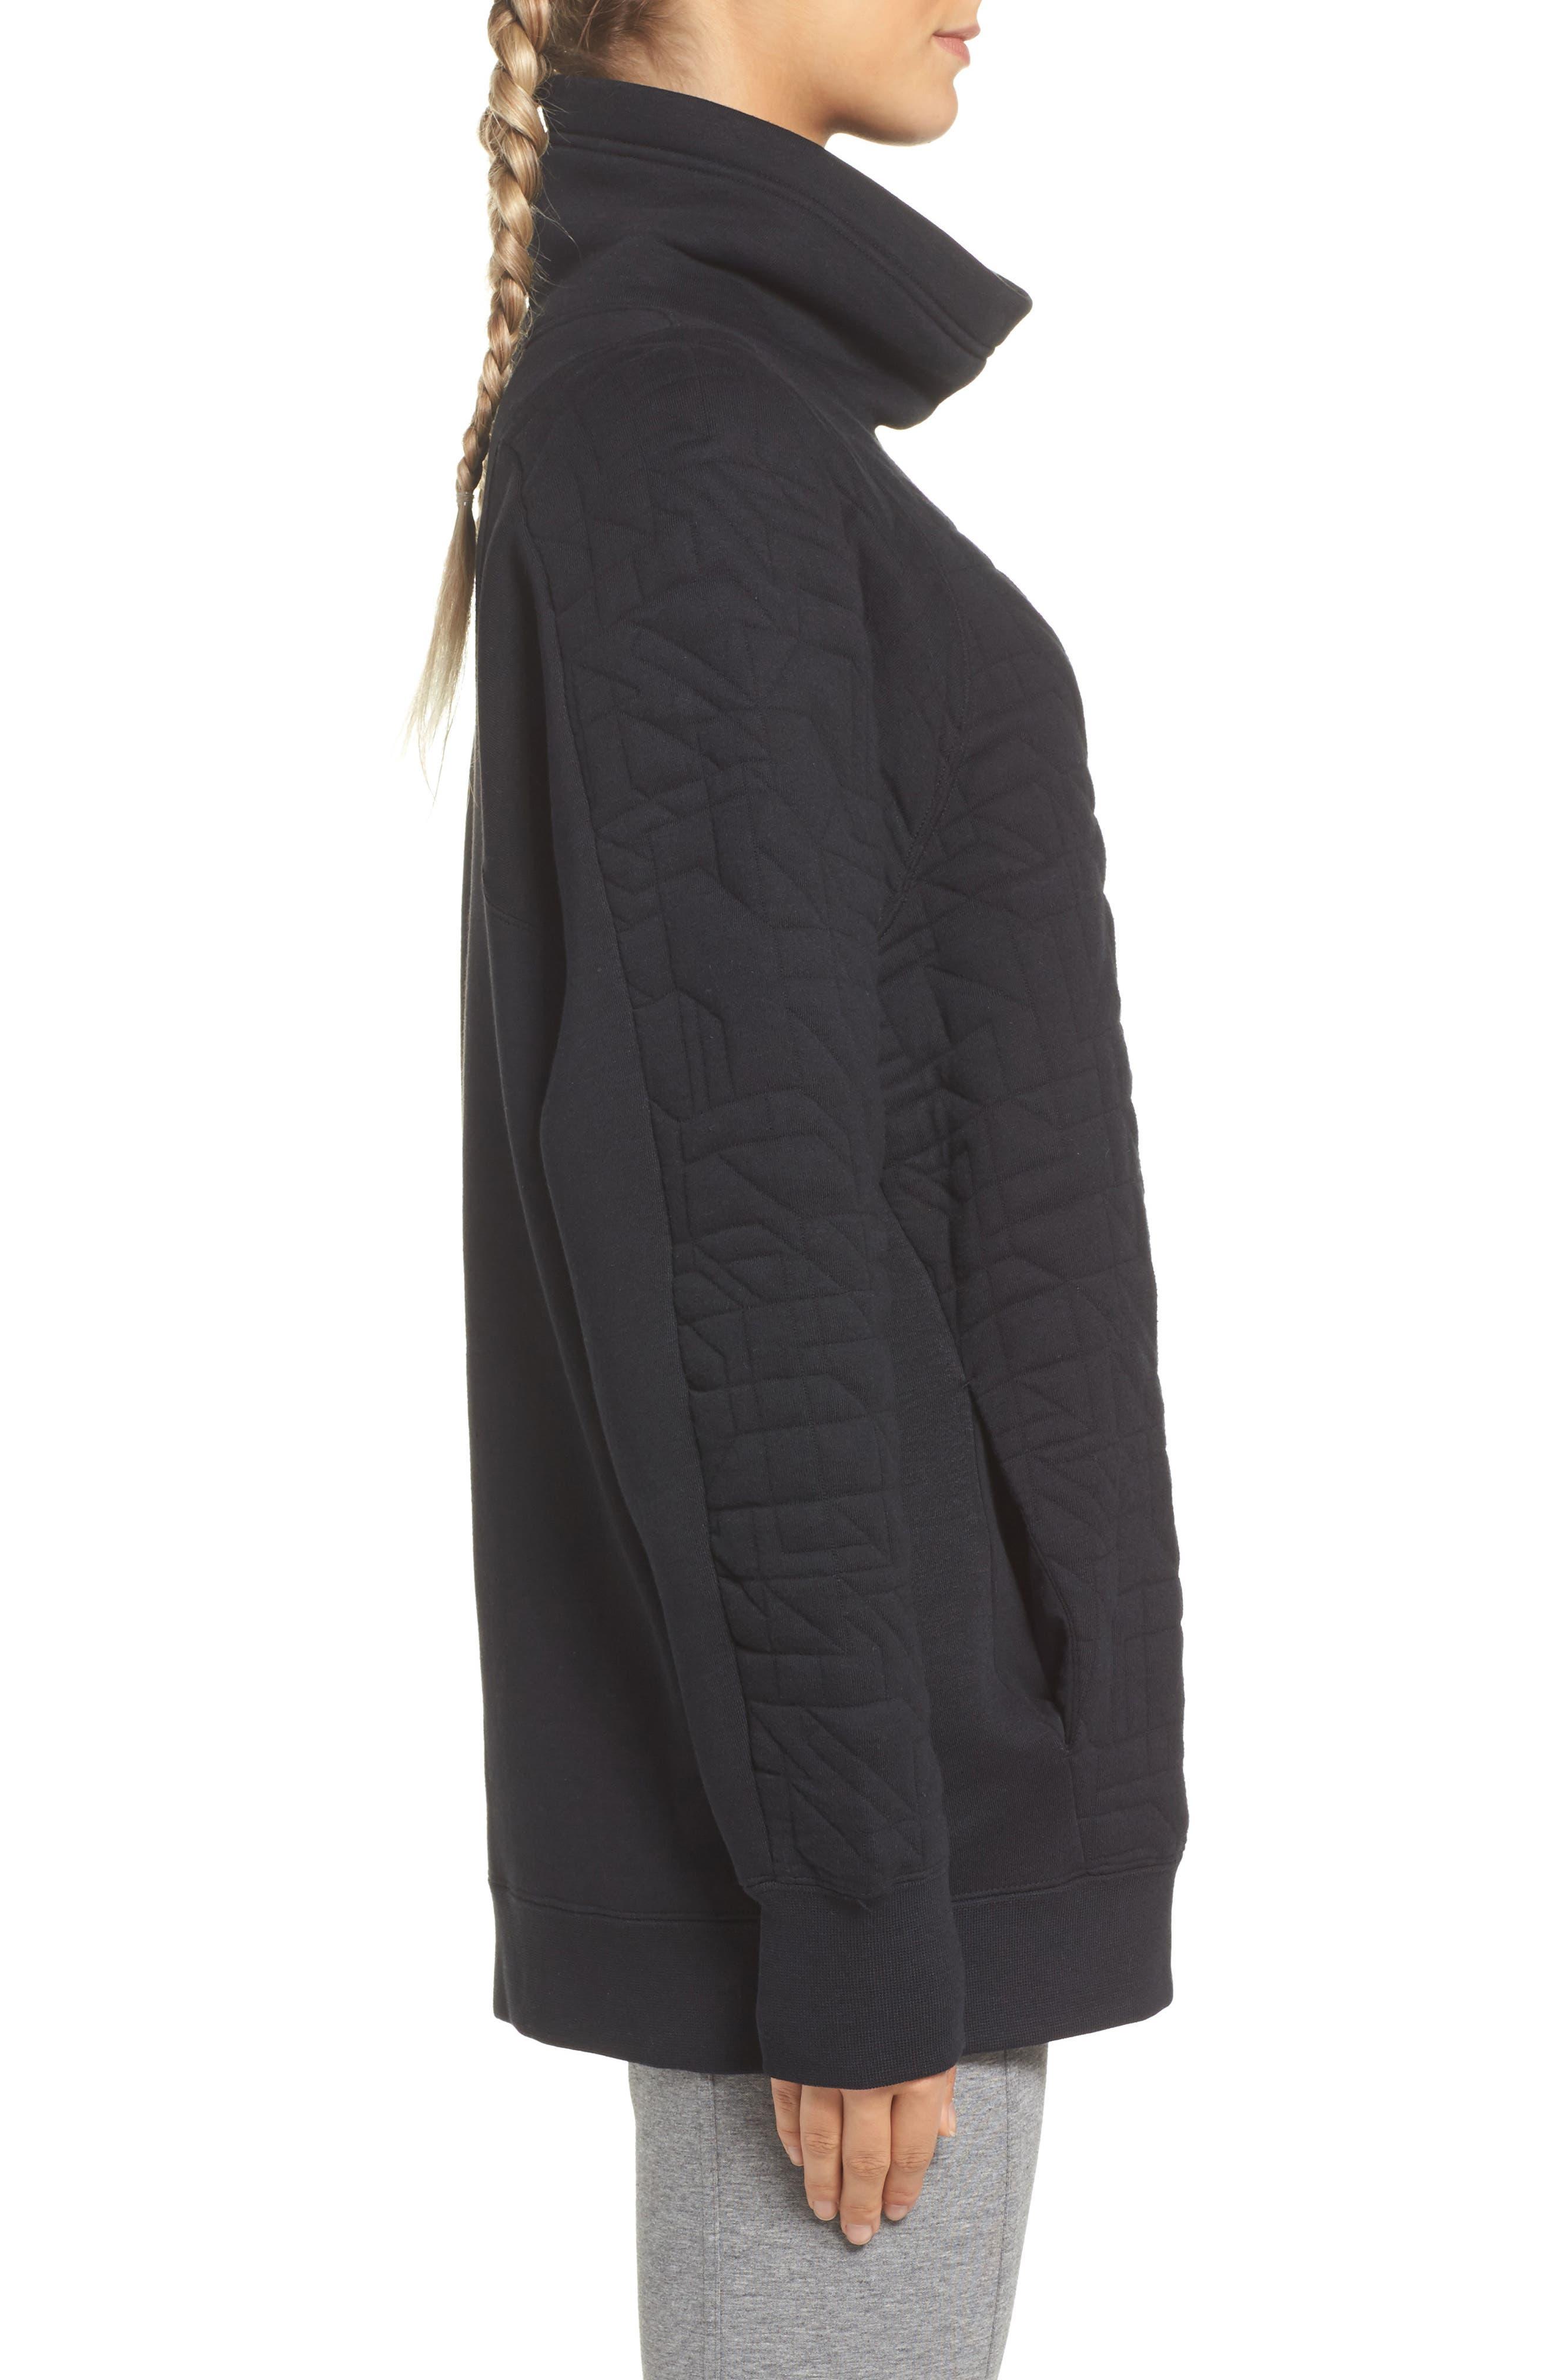 Sportswear Quilted Funnel Neck Pullover,                             Alternate thumbnail 3, color,                             Black/ Light Bone